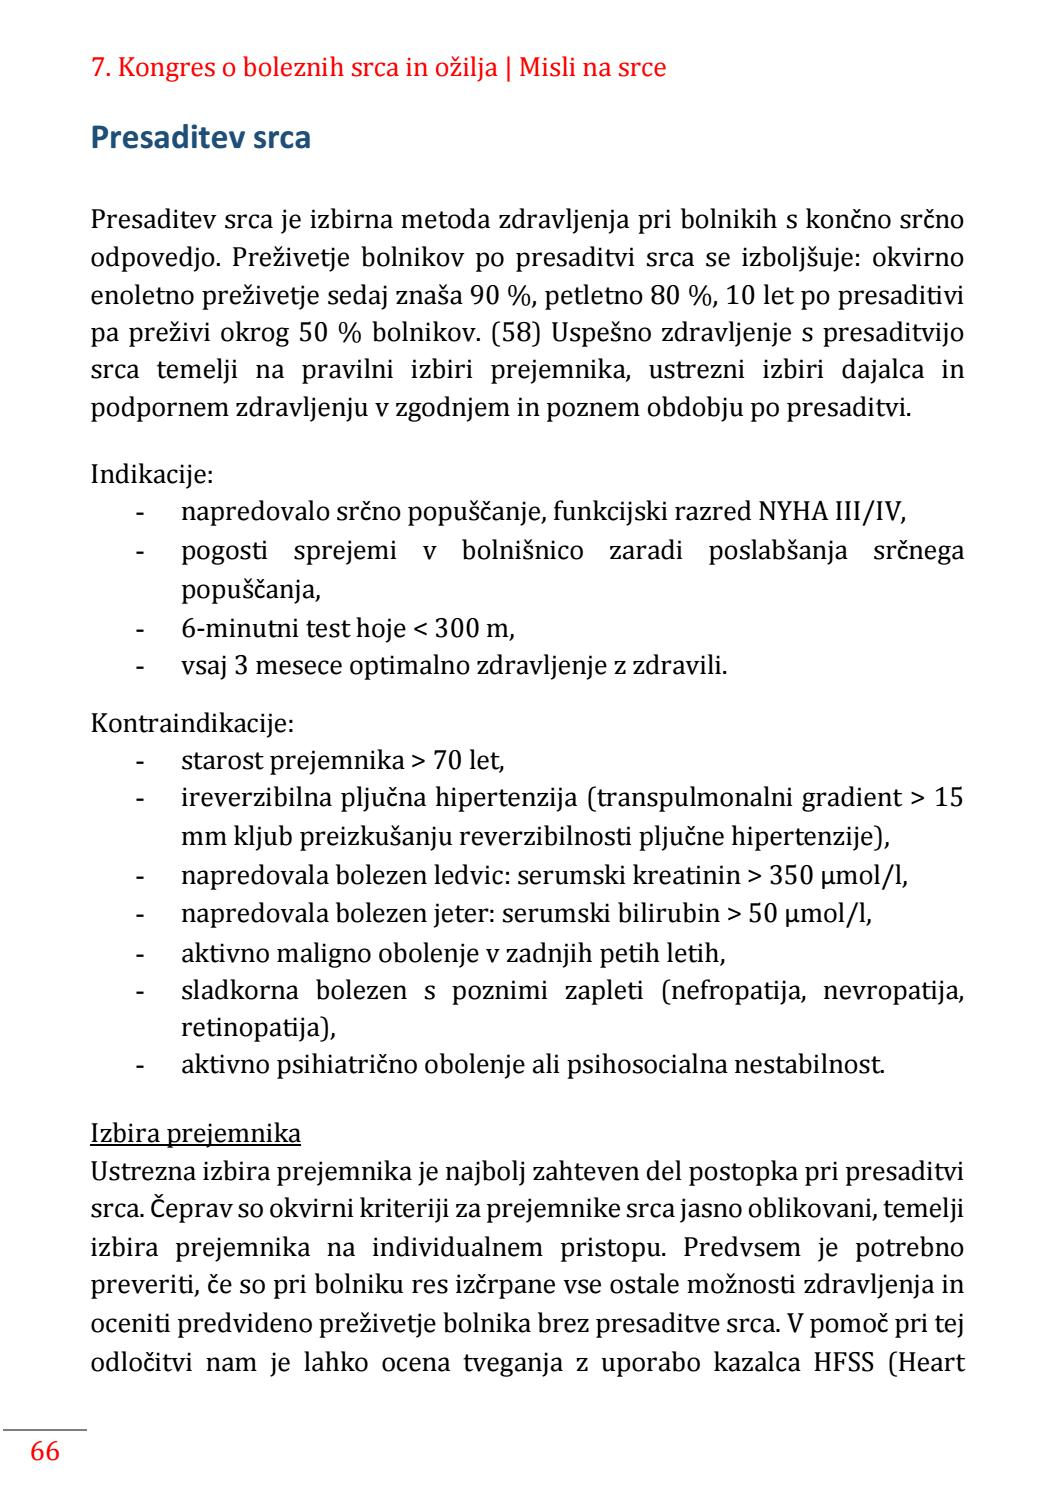 kreatinin, hipertenzija okruglice s hipertenzijom